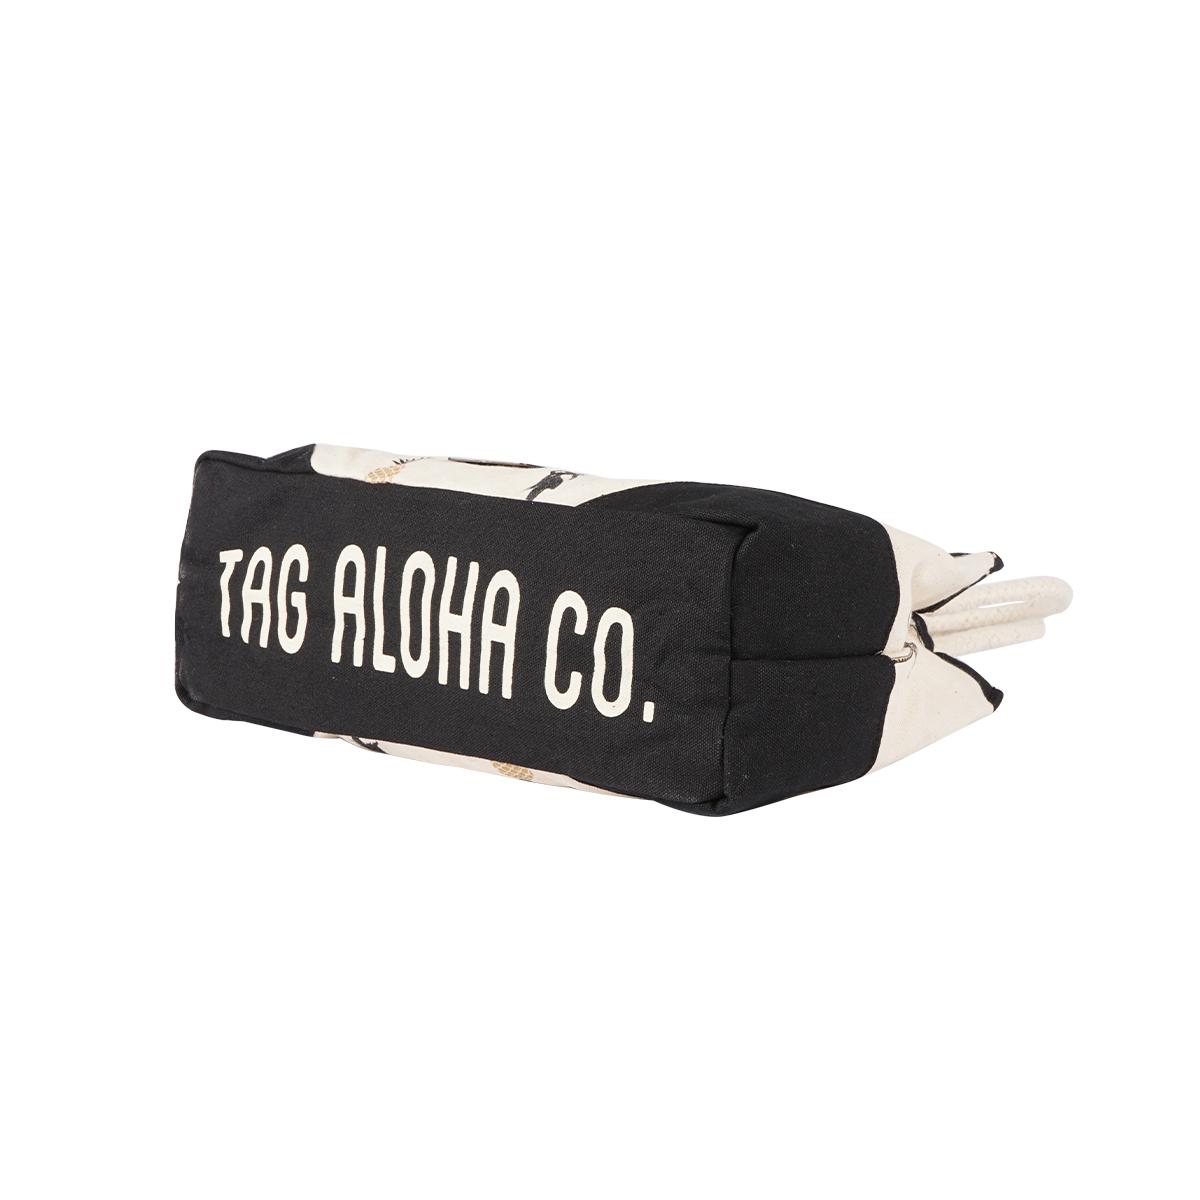 【30%OFF】【TAG ALOHA】PINEAPPLE×PALM トートバッグ S 日本限定デザイン (NATURAL) LA19050002